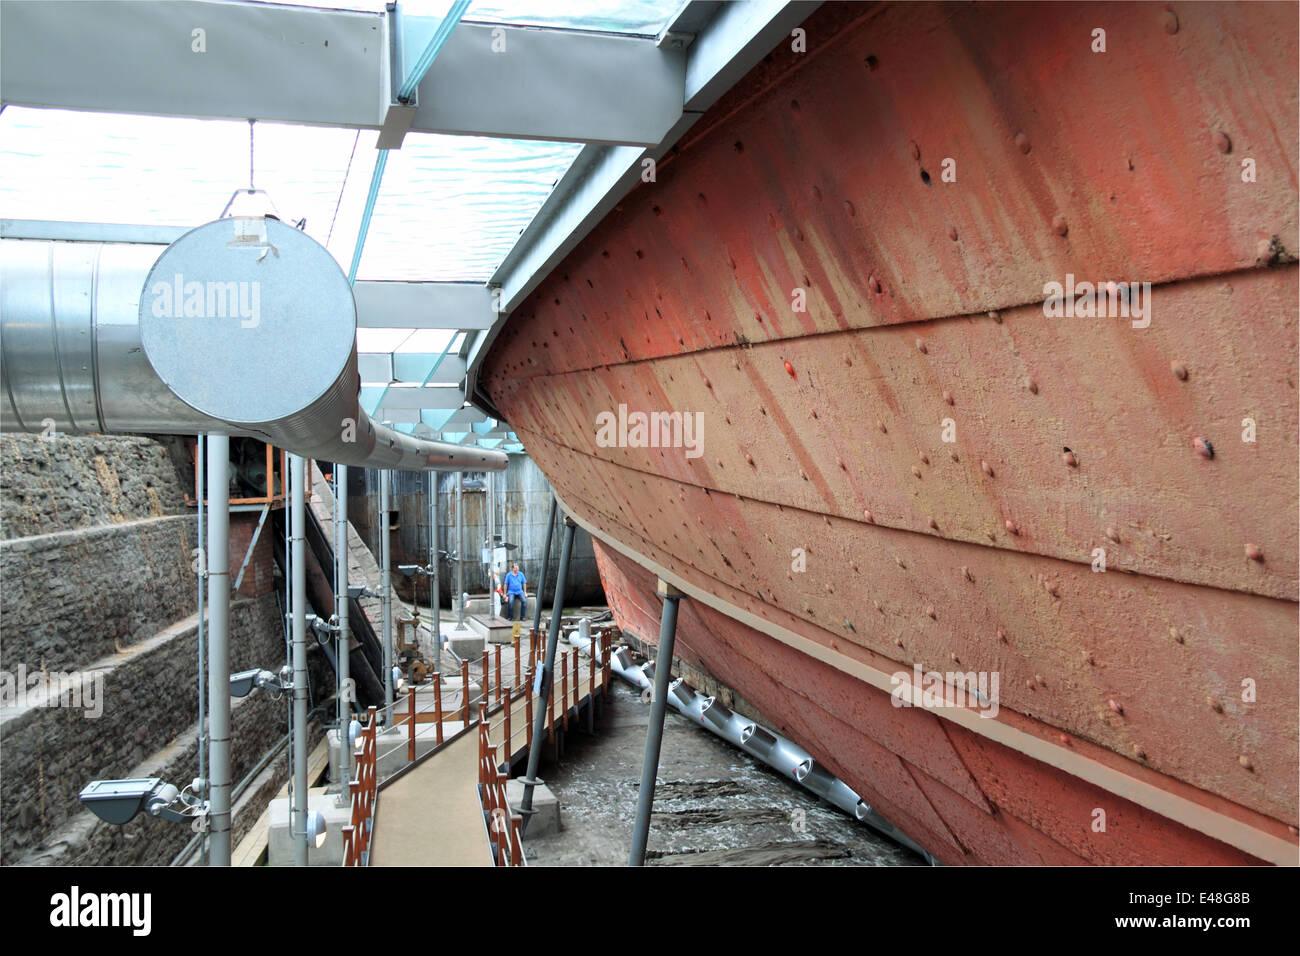 Hull of SS Great Britain, Bristol Docks, England, Great Britain, United Kingdom, UK, Europe Stock Photo